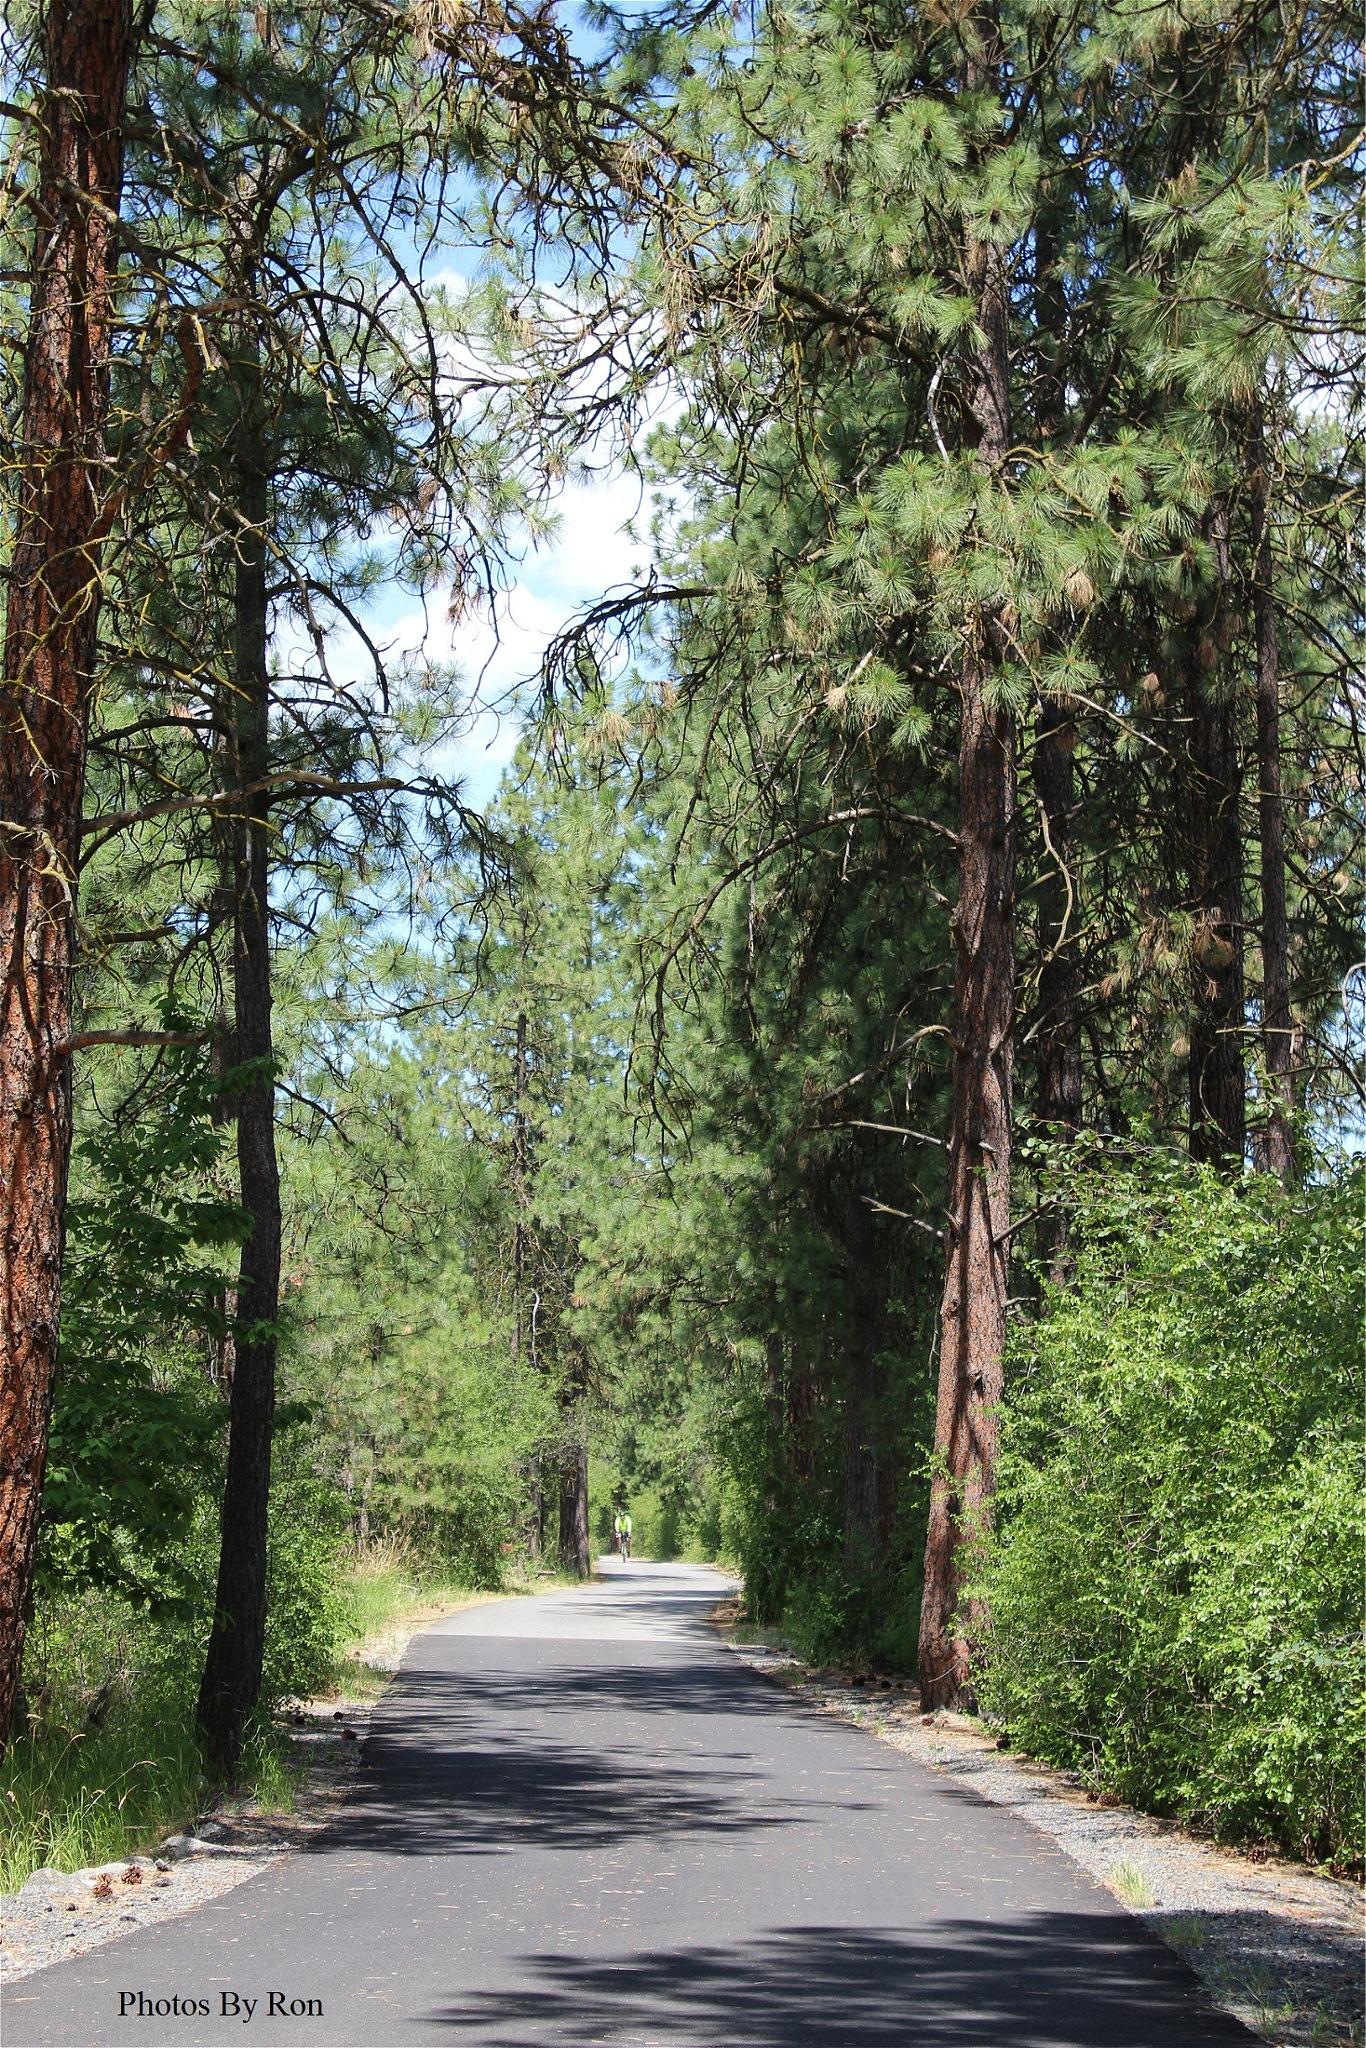 """Corridor Through The Forest"" by Ron Berkley"